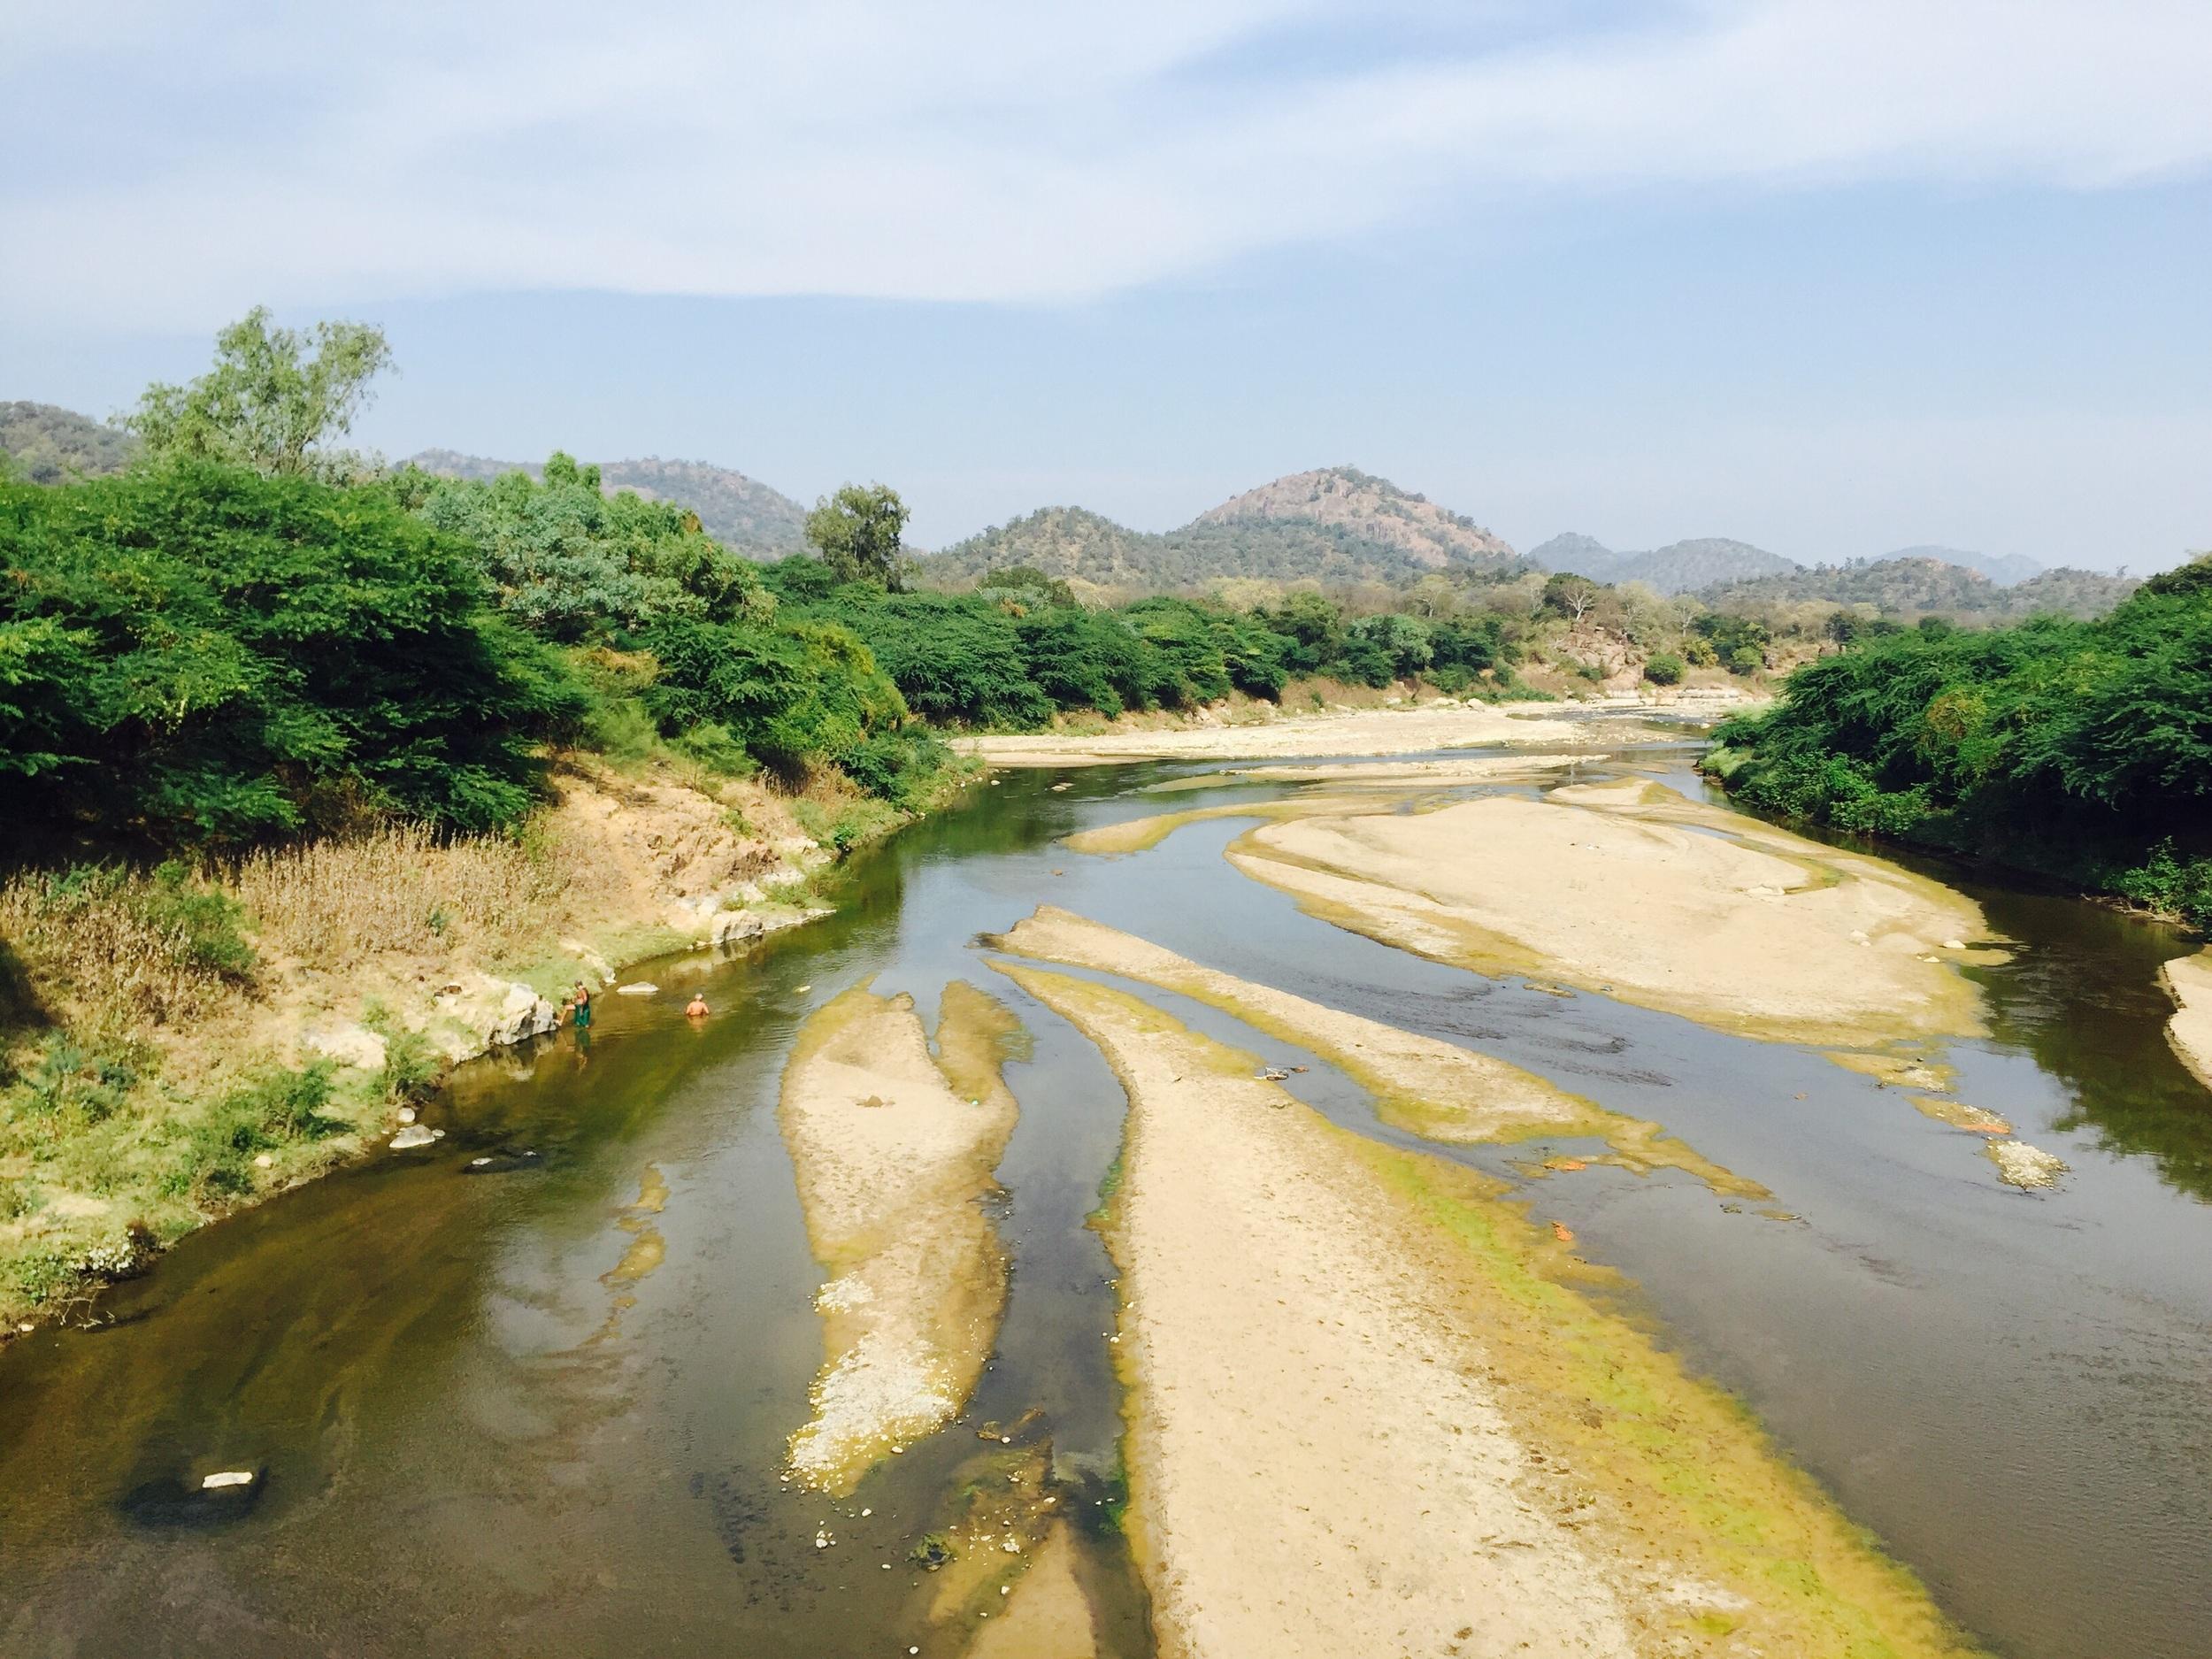 Crossing the border into Tamil Nadu - Kaveri River